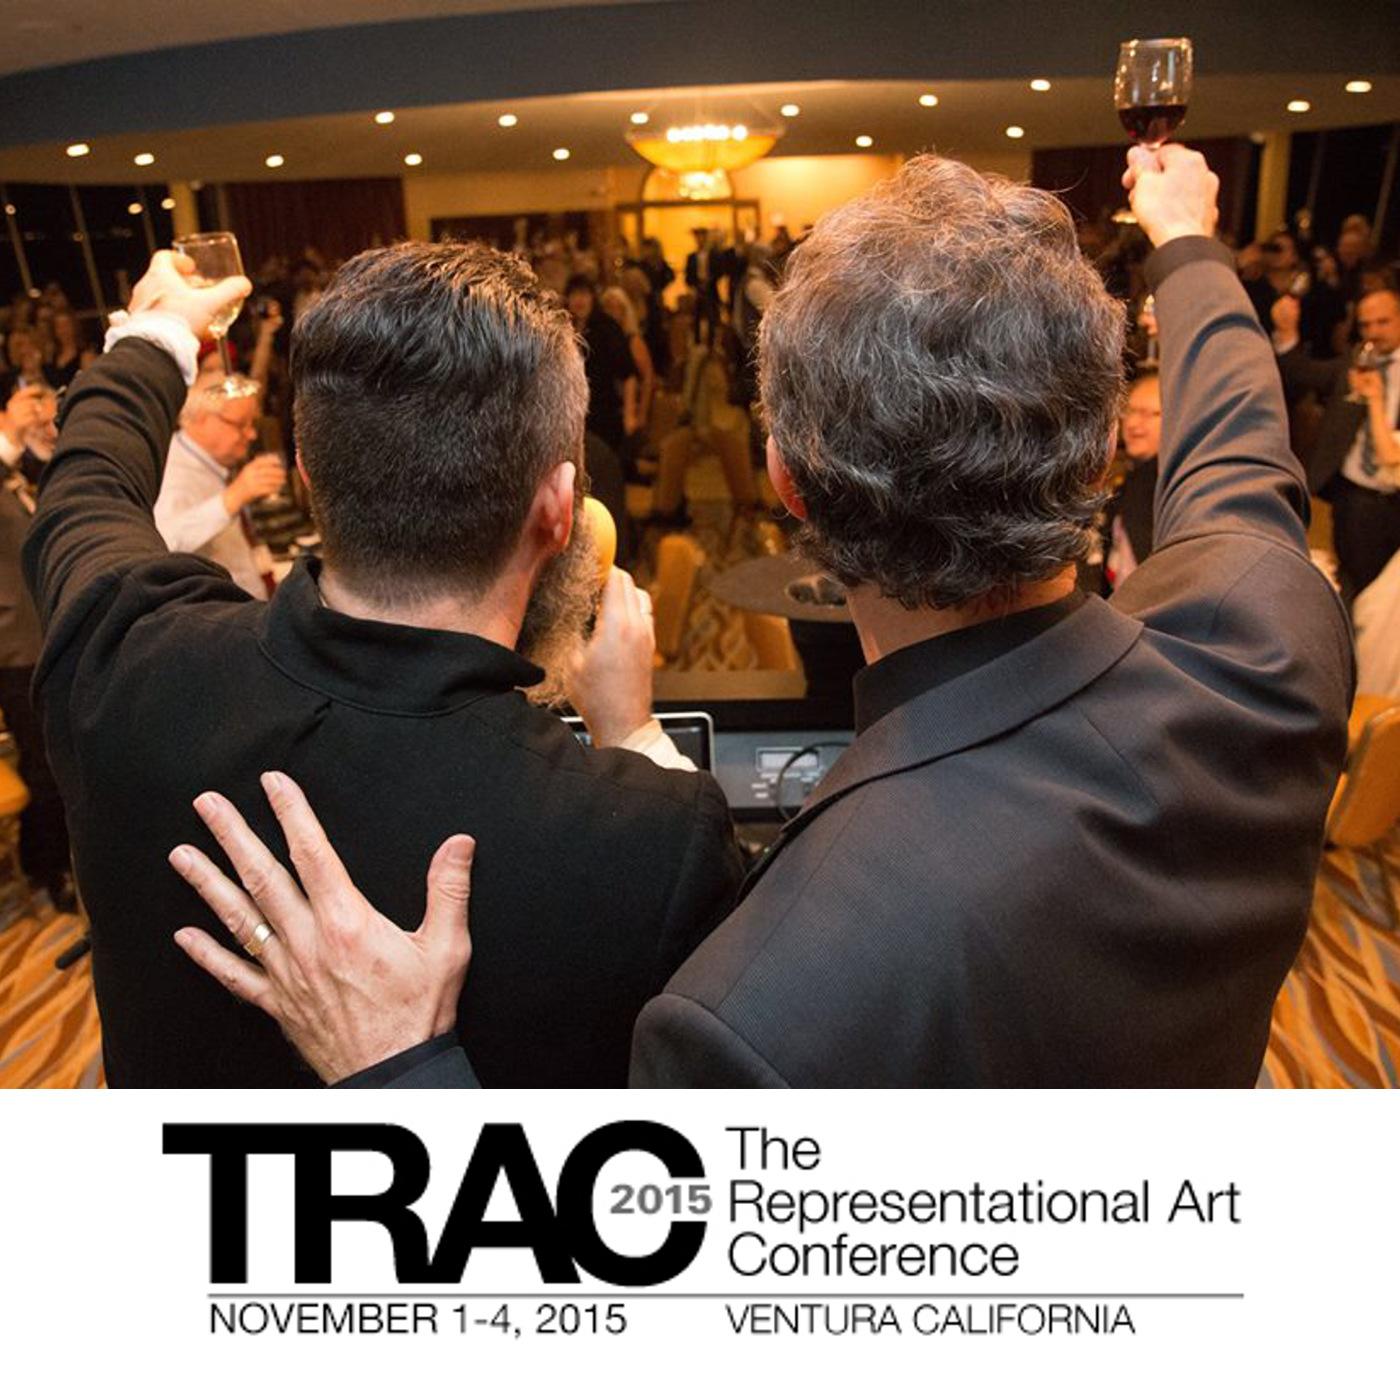 Episode 42 - TRAC 2015